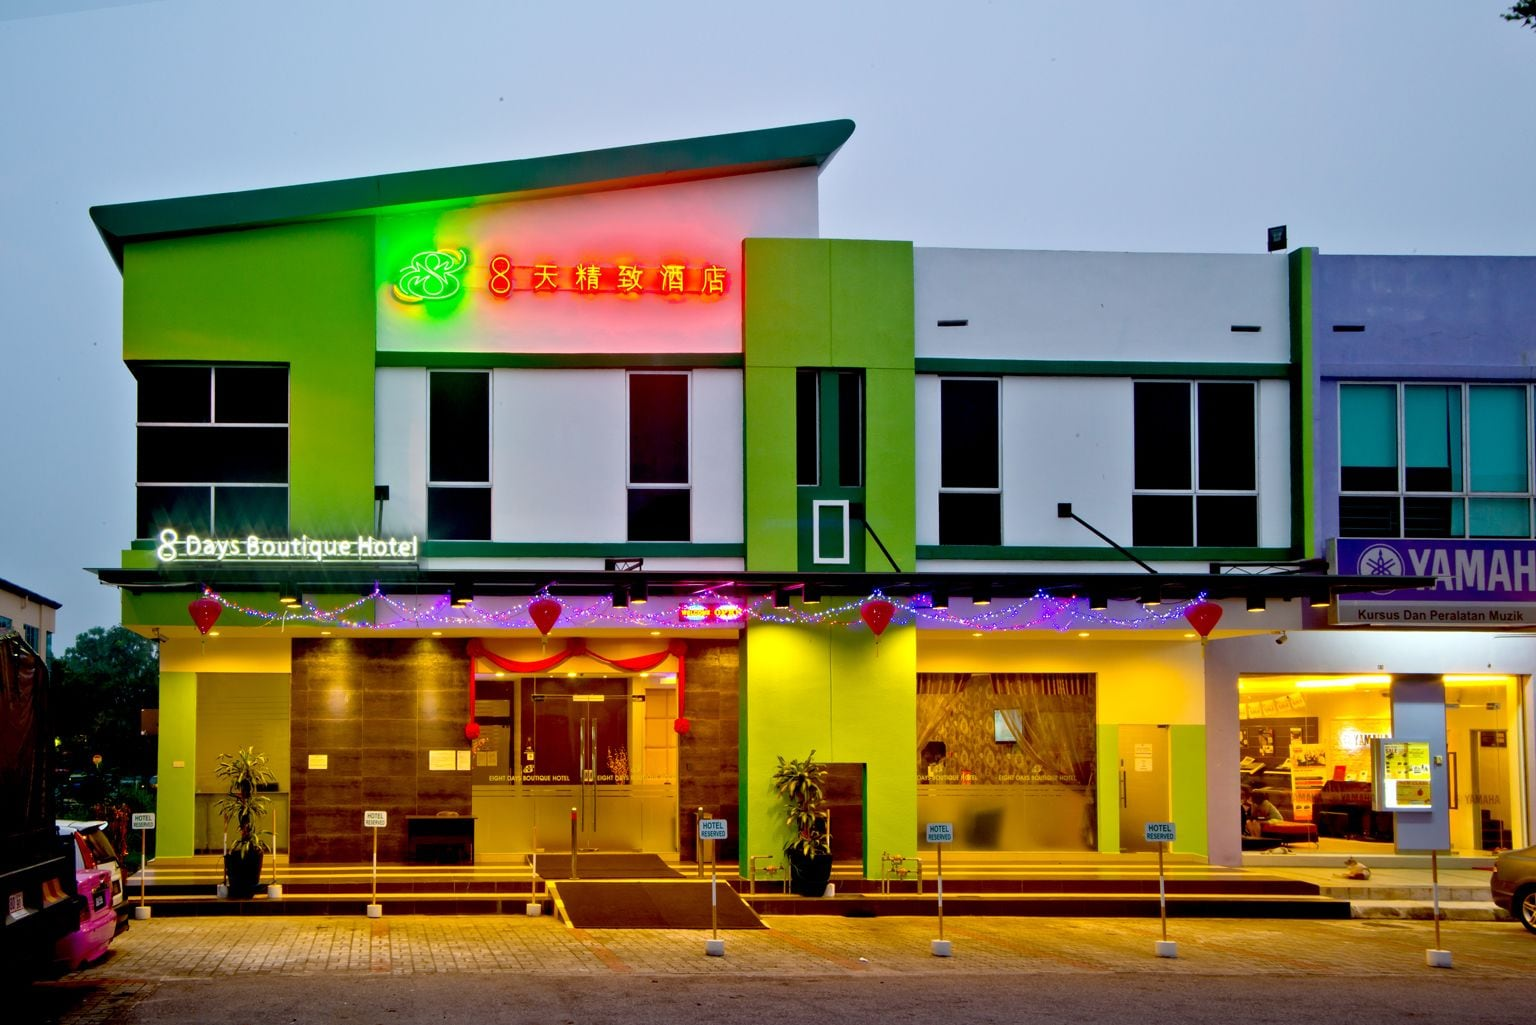 Eight Days Boutique Hotel @ ImpianEmas Skudai, Johor Bahru